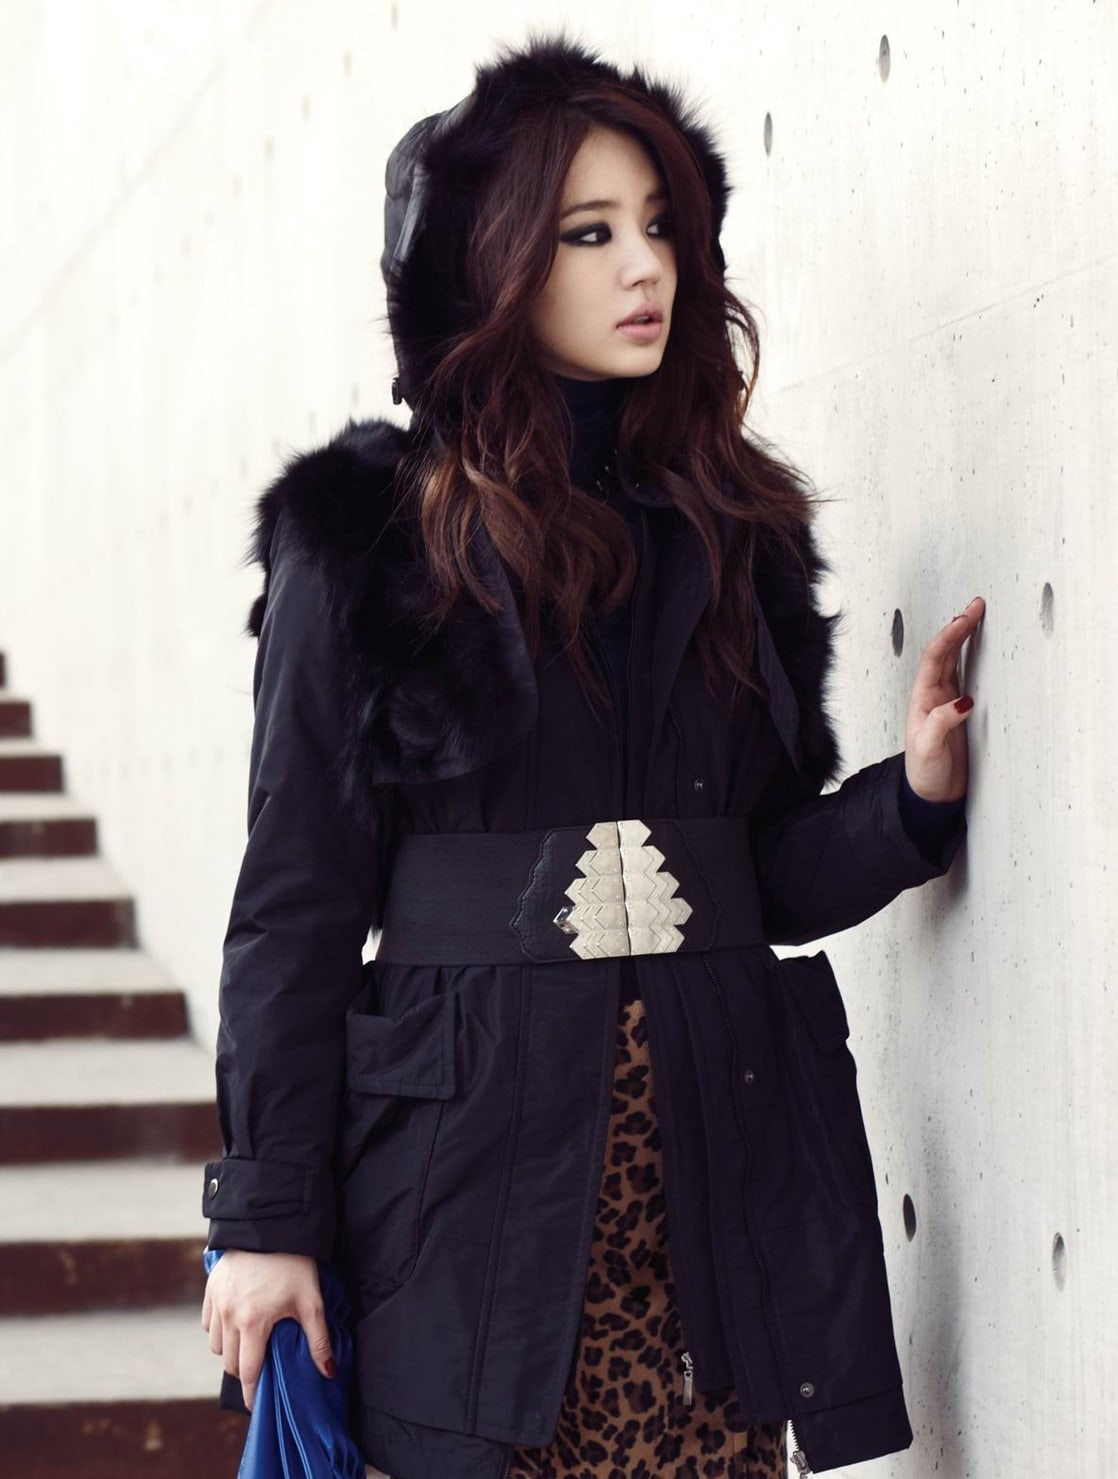 Kitty Lee